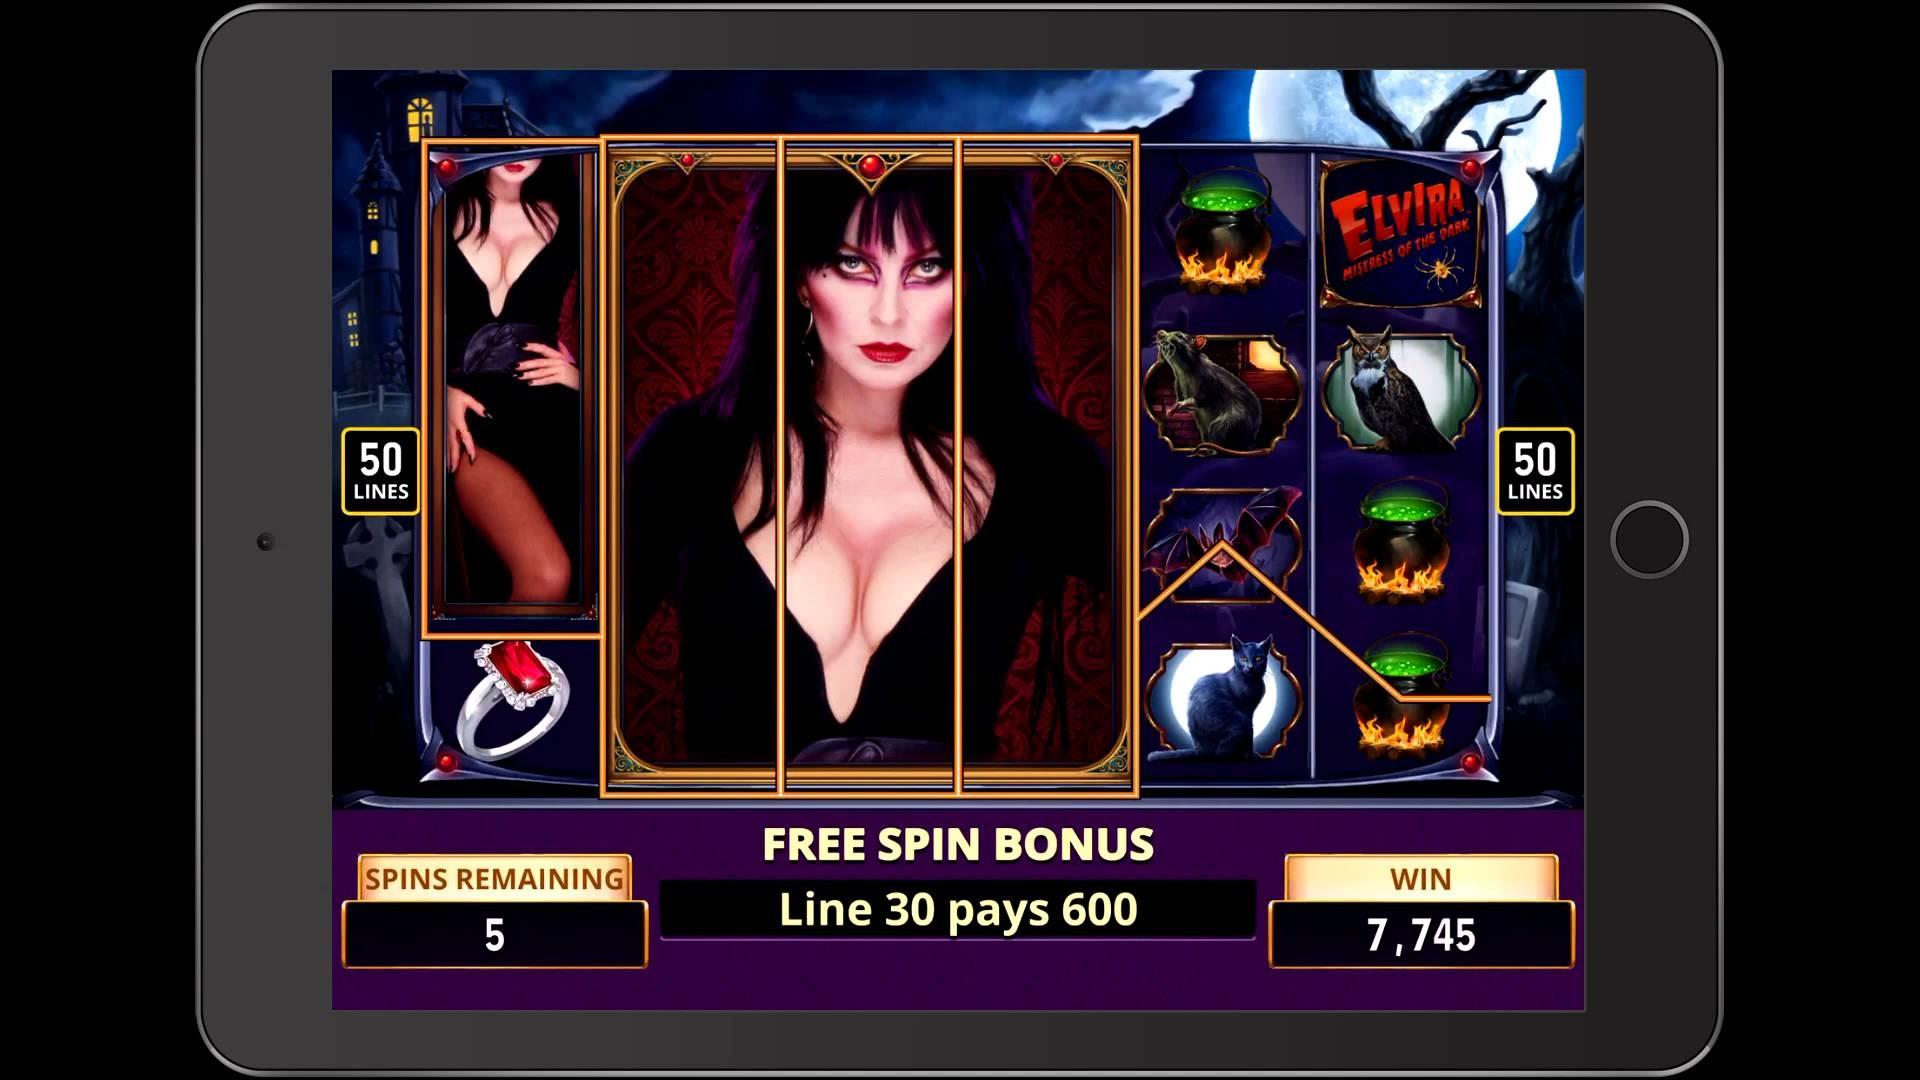 ELVIRA MISTRESS OF THE DARK Penny Video Slot Game with an ELVIRA FREE SPIN  BONUS